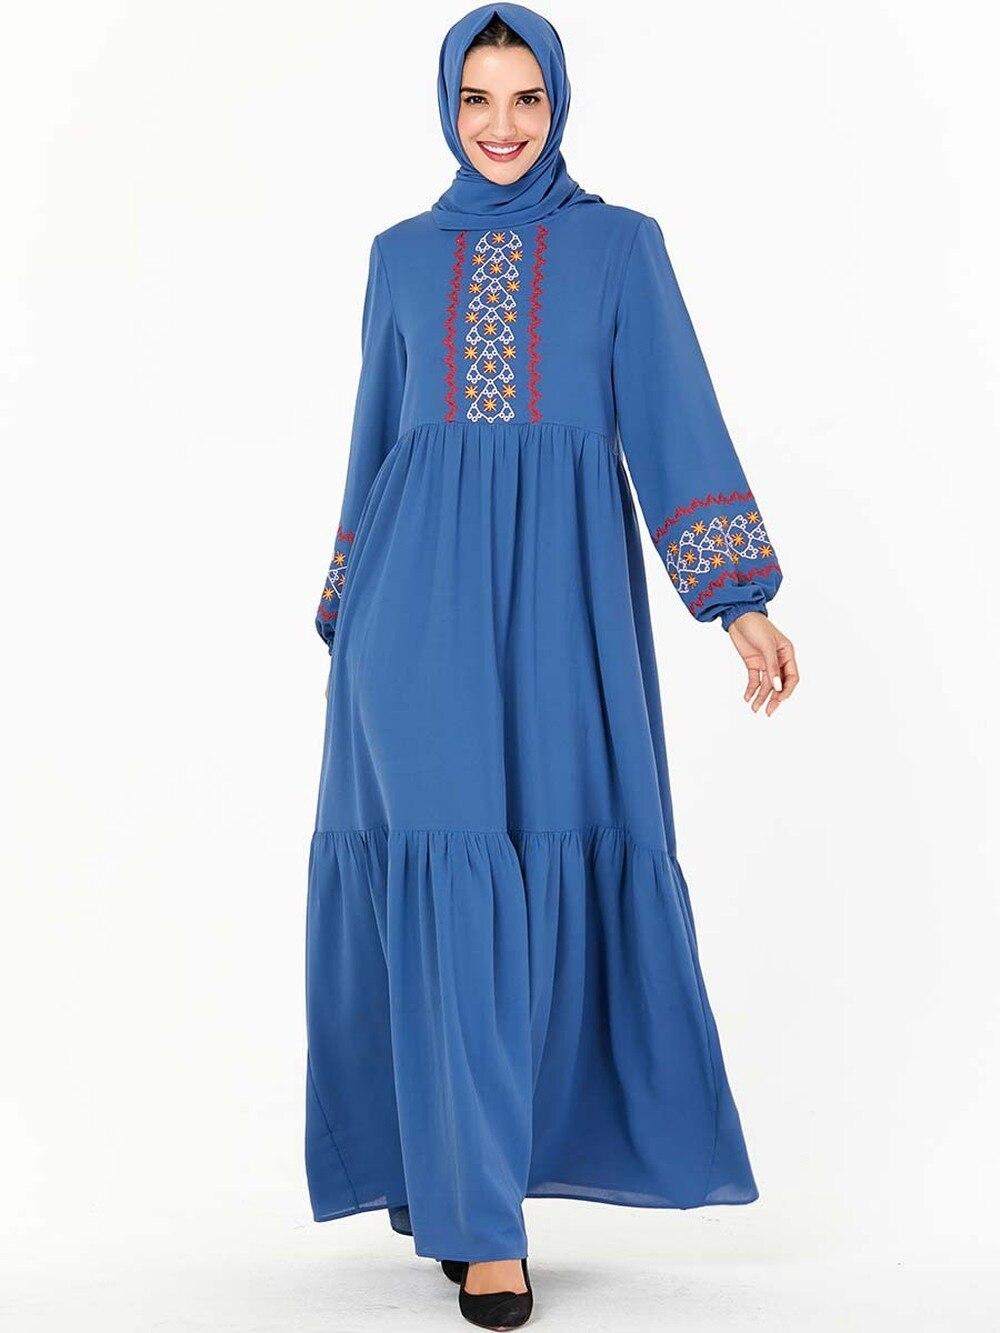 Las mujeres musulmanas de manga larga Dubai Hijab oro terciopelo verde vestido árabe Kaftan Abaya modesto islámico Turquía Jalabiya vestido de talla grande